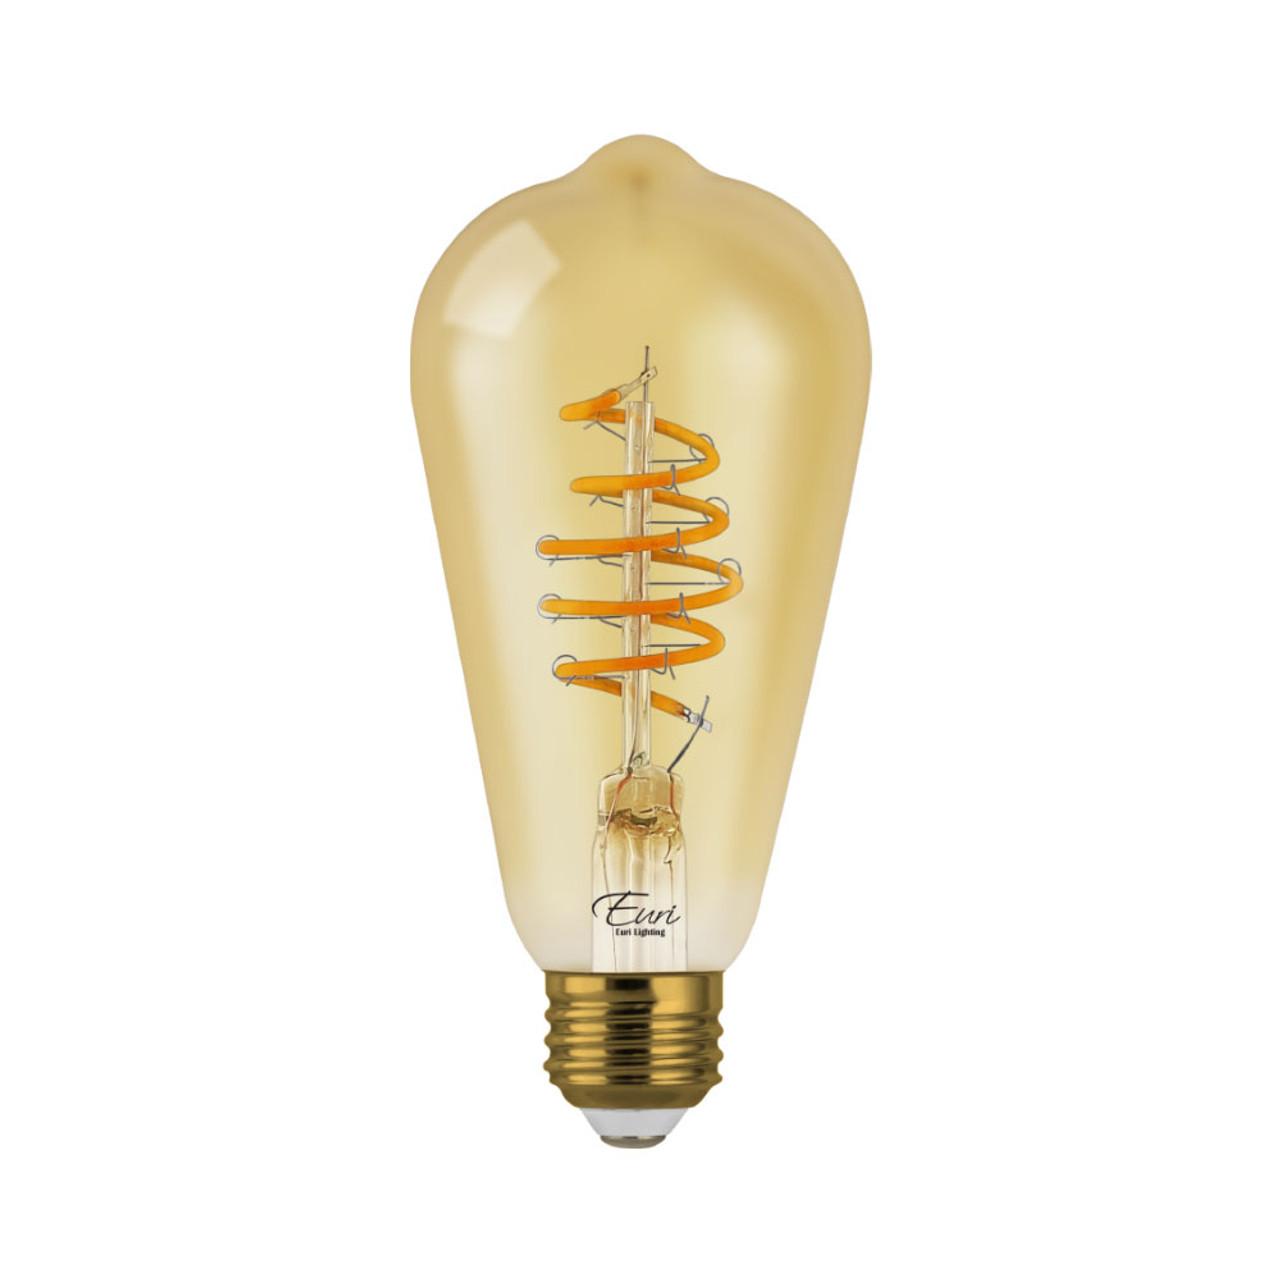 A19, Omni-Directional, LED Light Bulb, Dimmable, 4.5 W, 120 V, 250 lm, 2200 K, E26 Base, Amber Glass Body (VST19-3020ad)